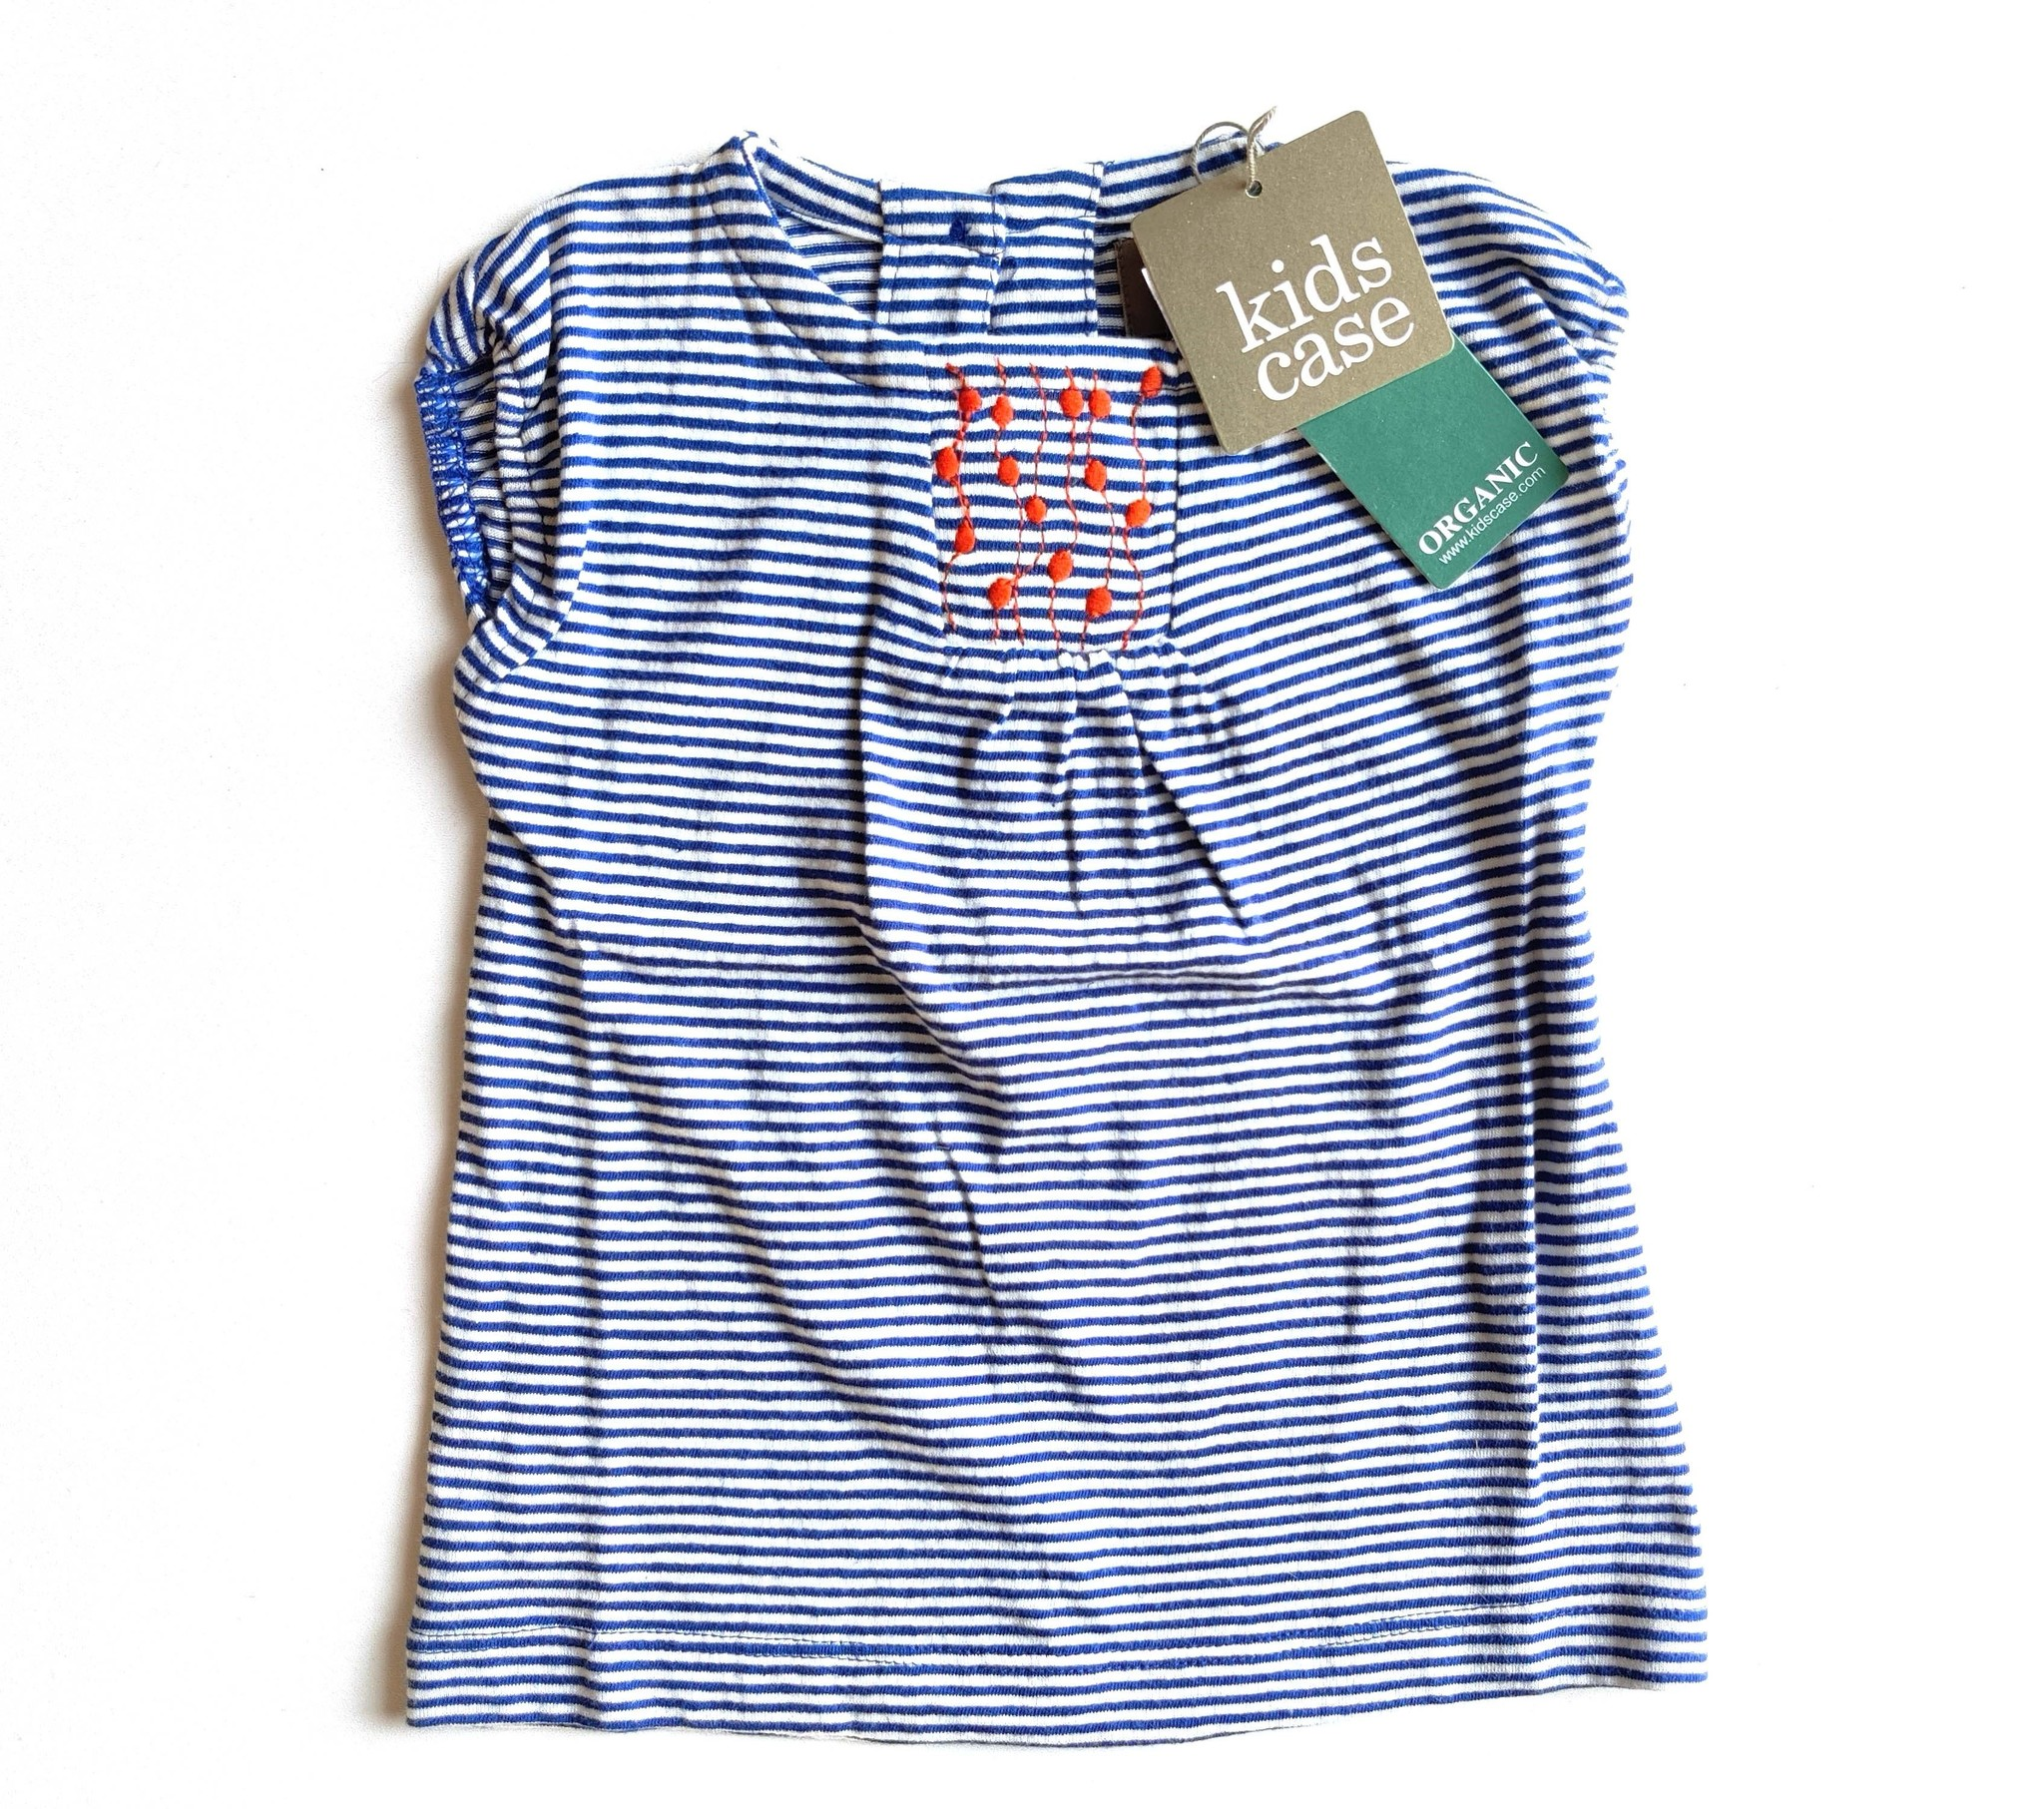 Nieuwe jurk Kids Case-1